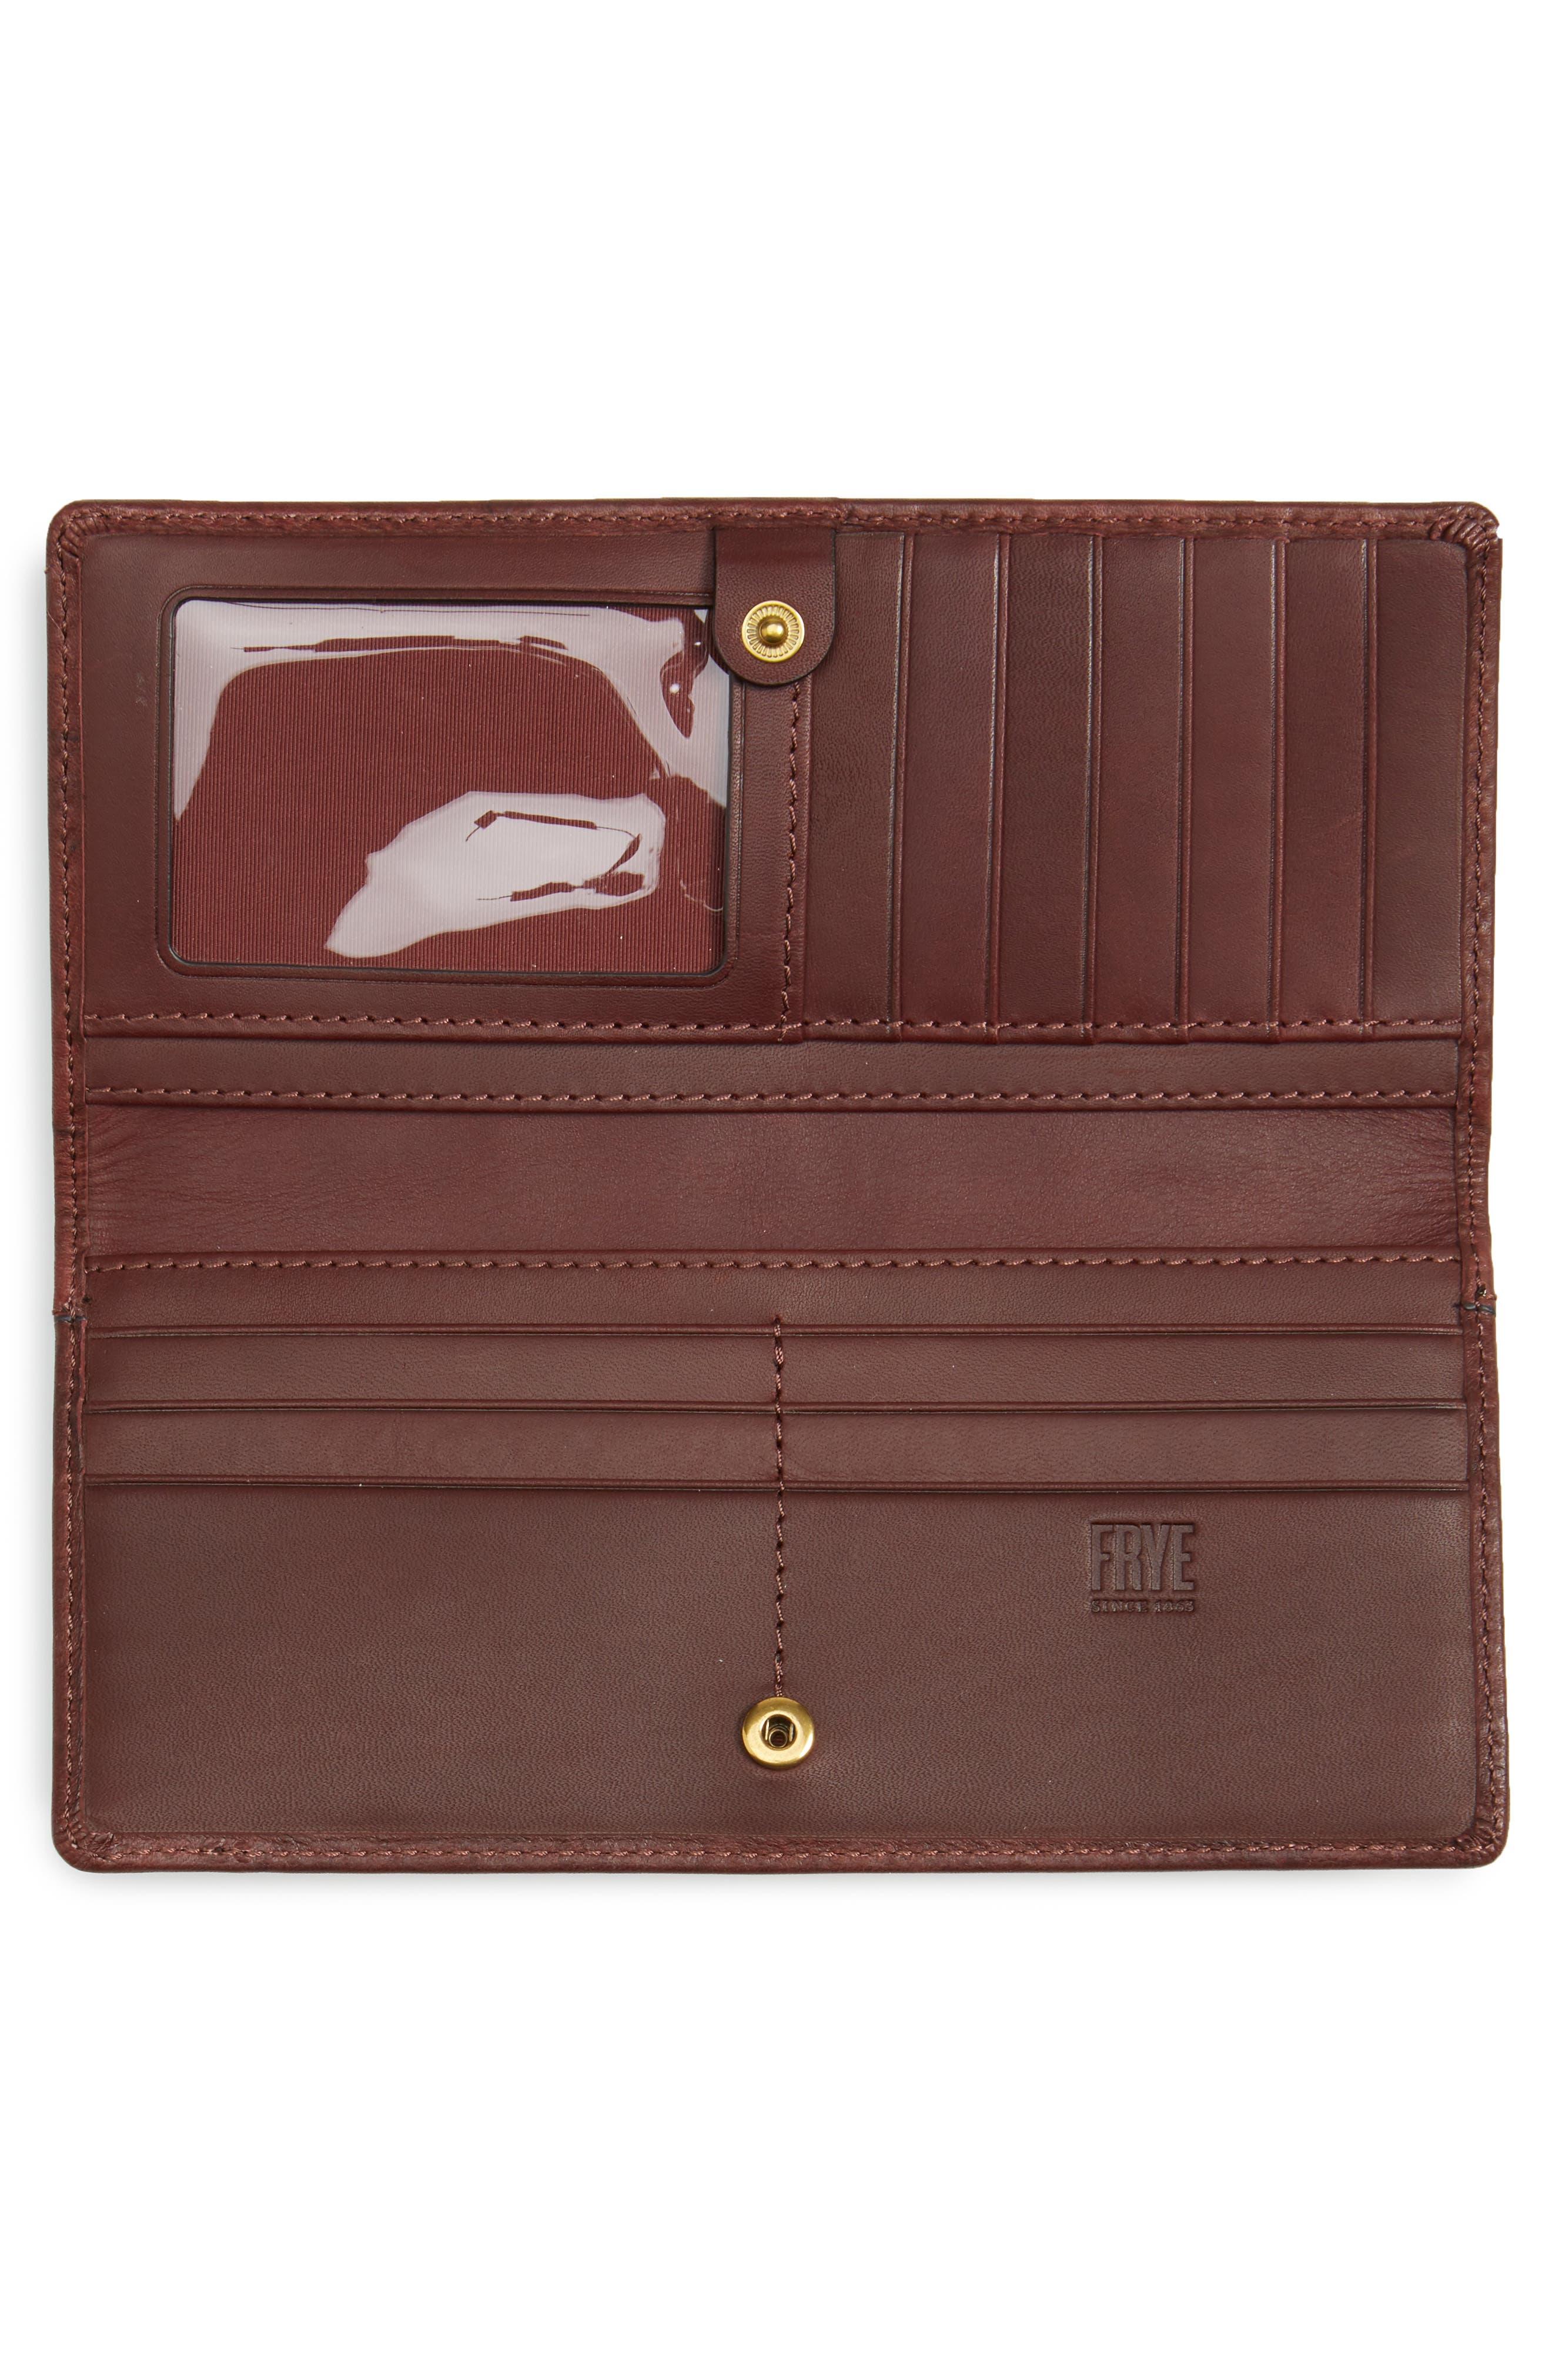 Alternate Image 2  - Frye Campus Rivet Slim Leather Wallet